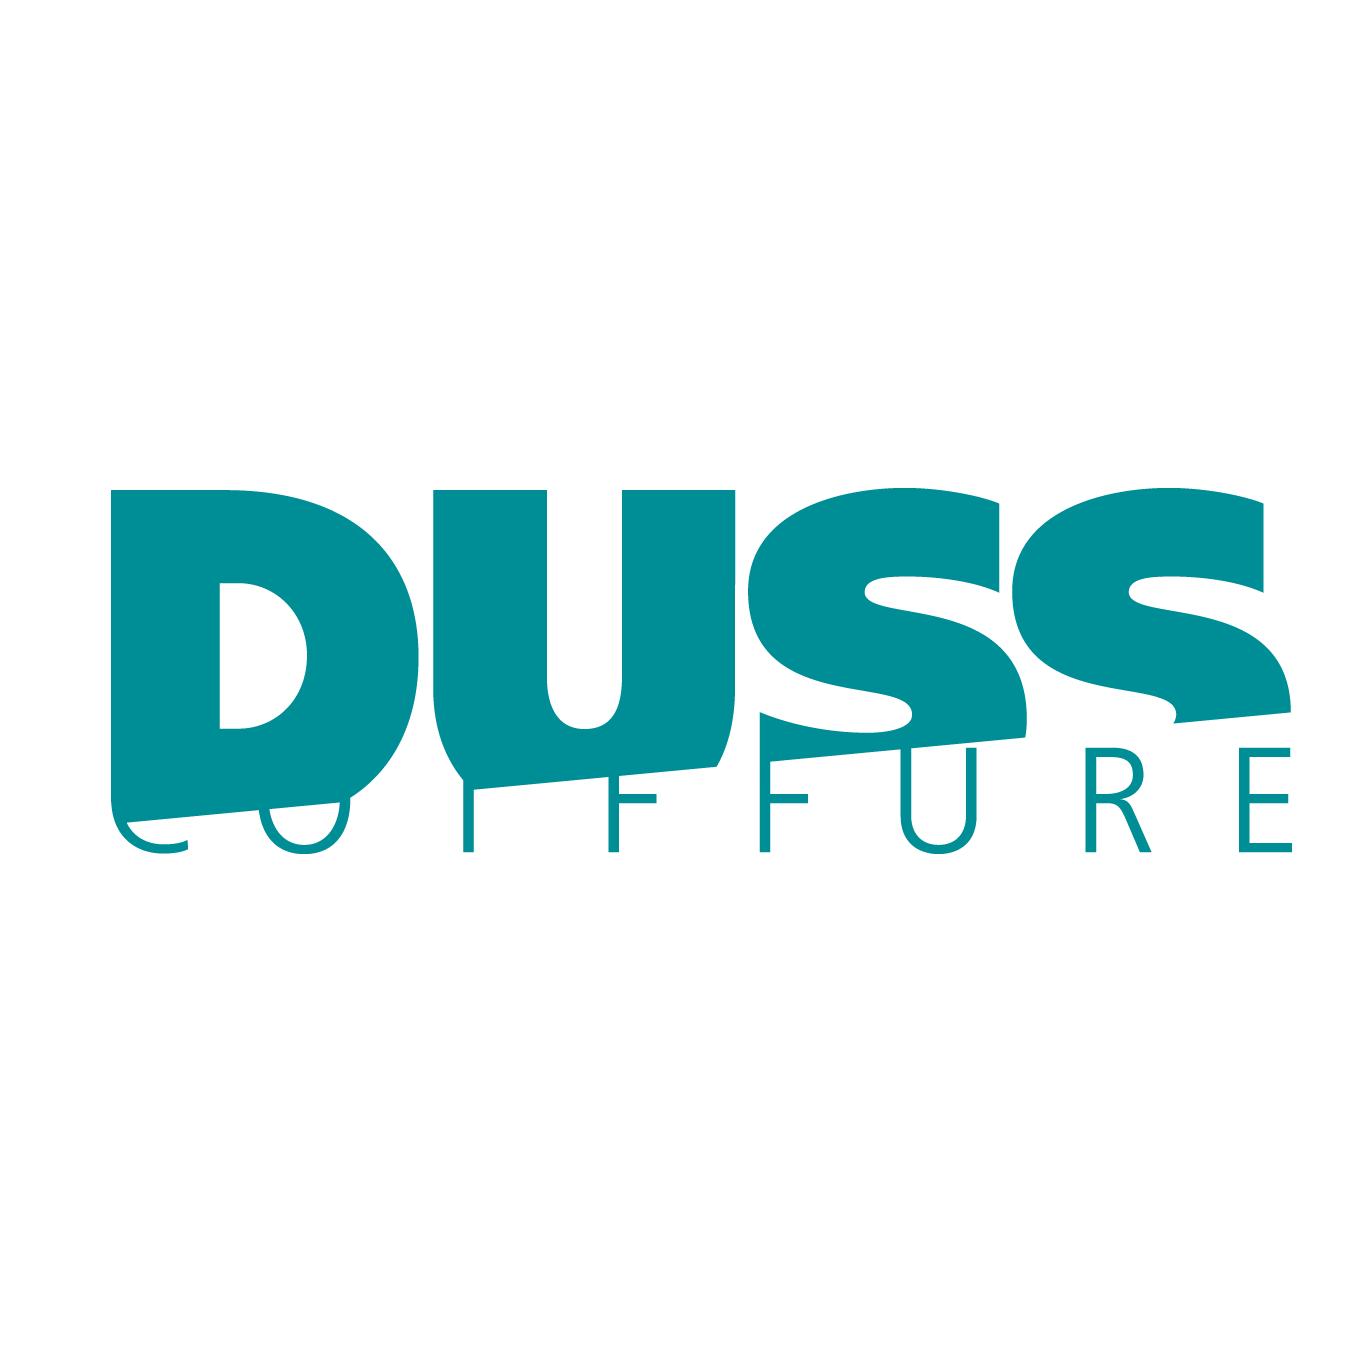 Duss Coiffure